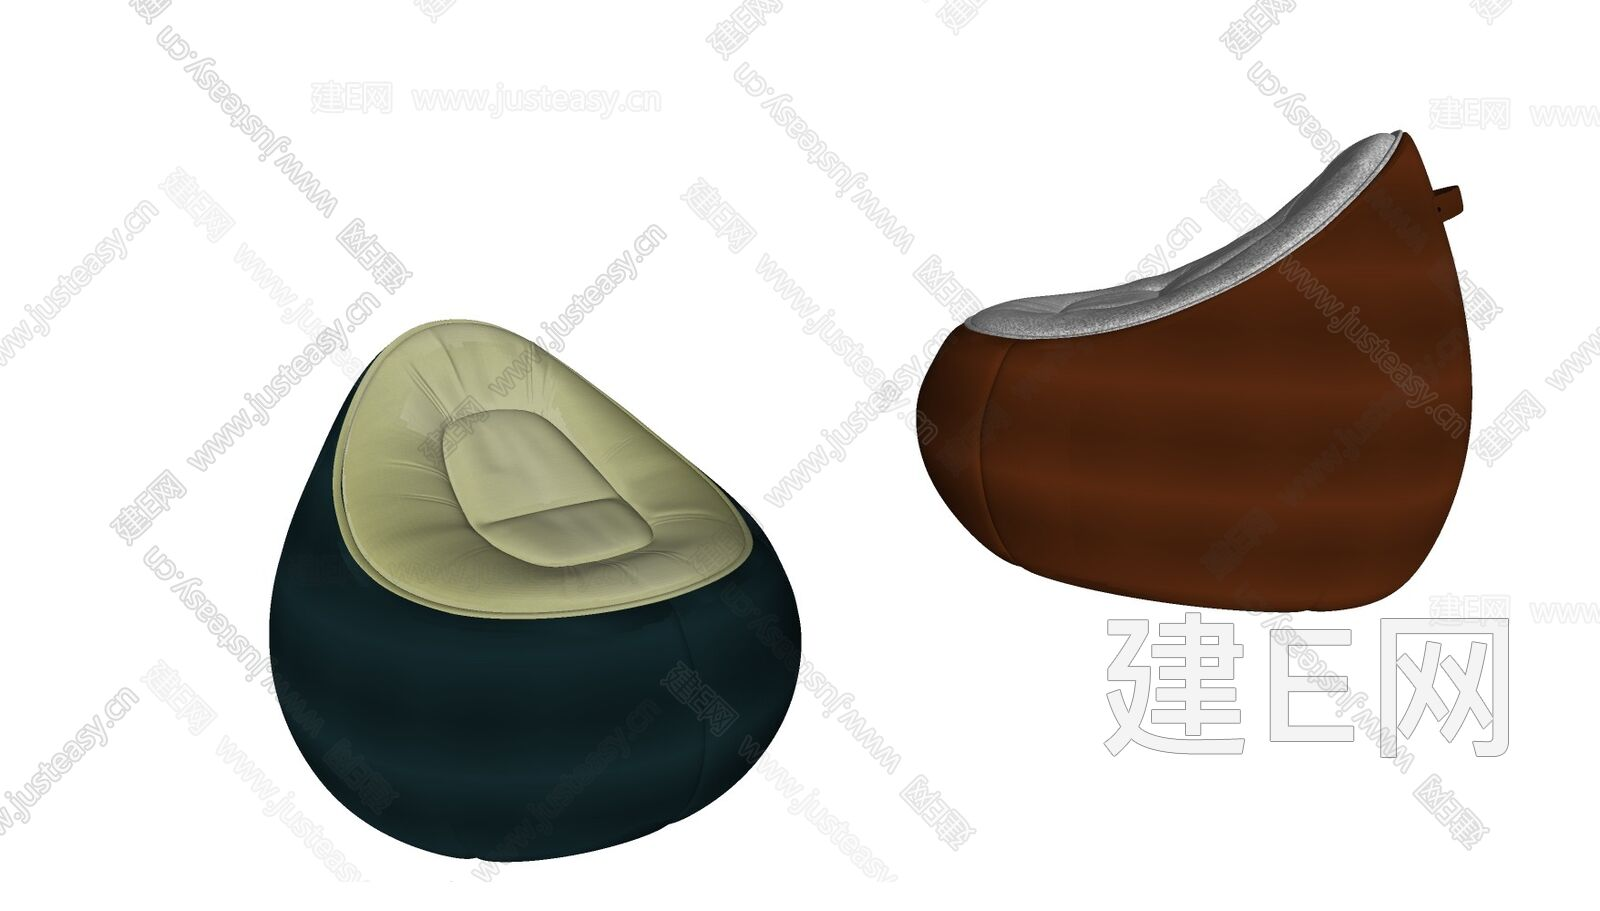 现代懒人沙发sketchup模型